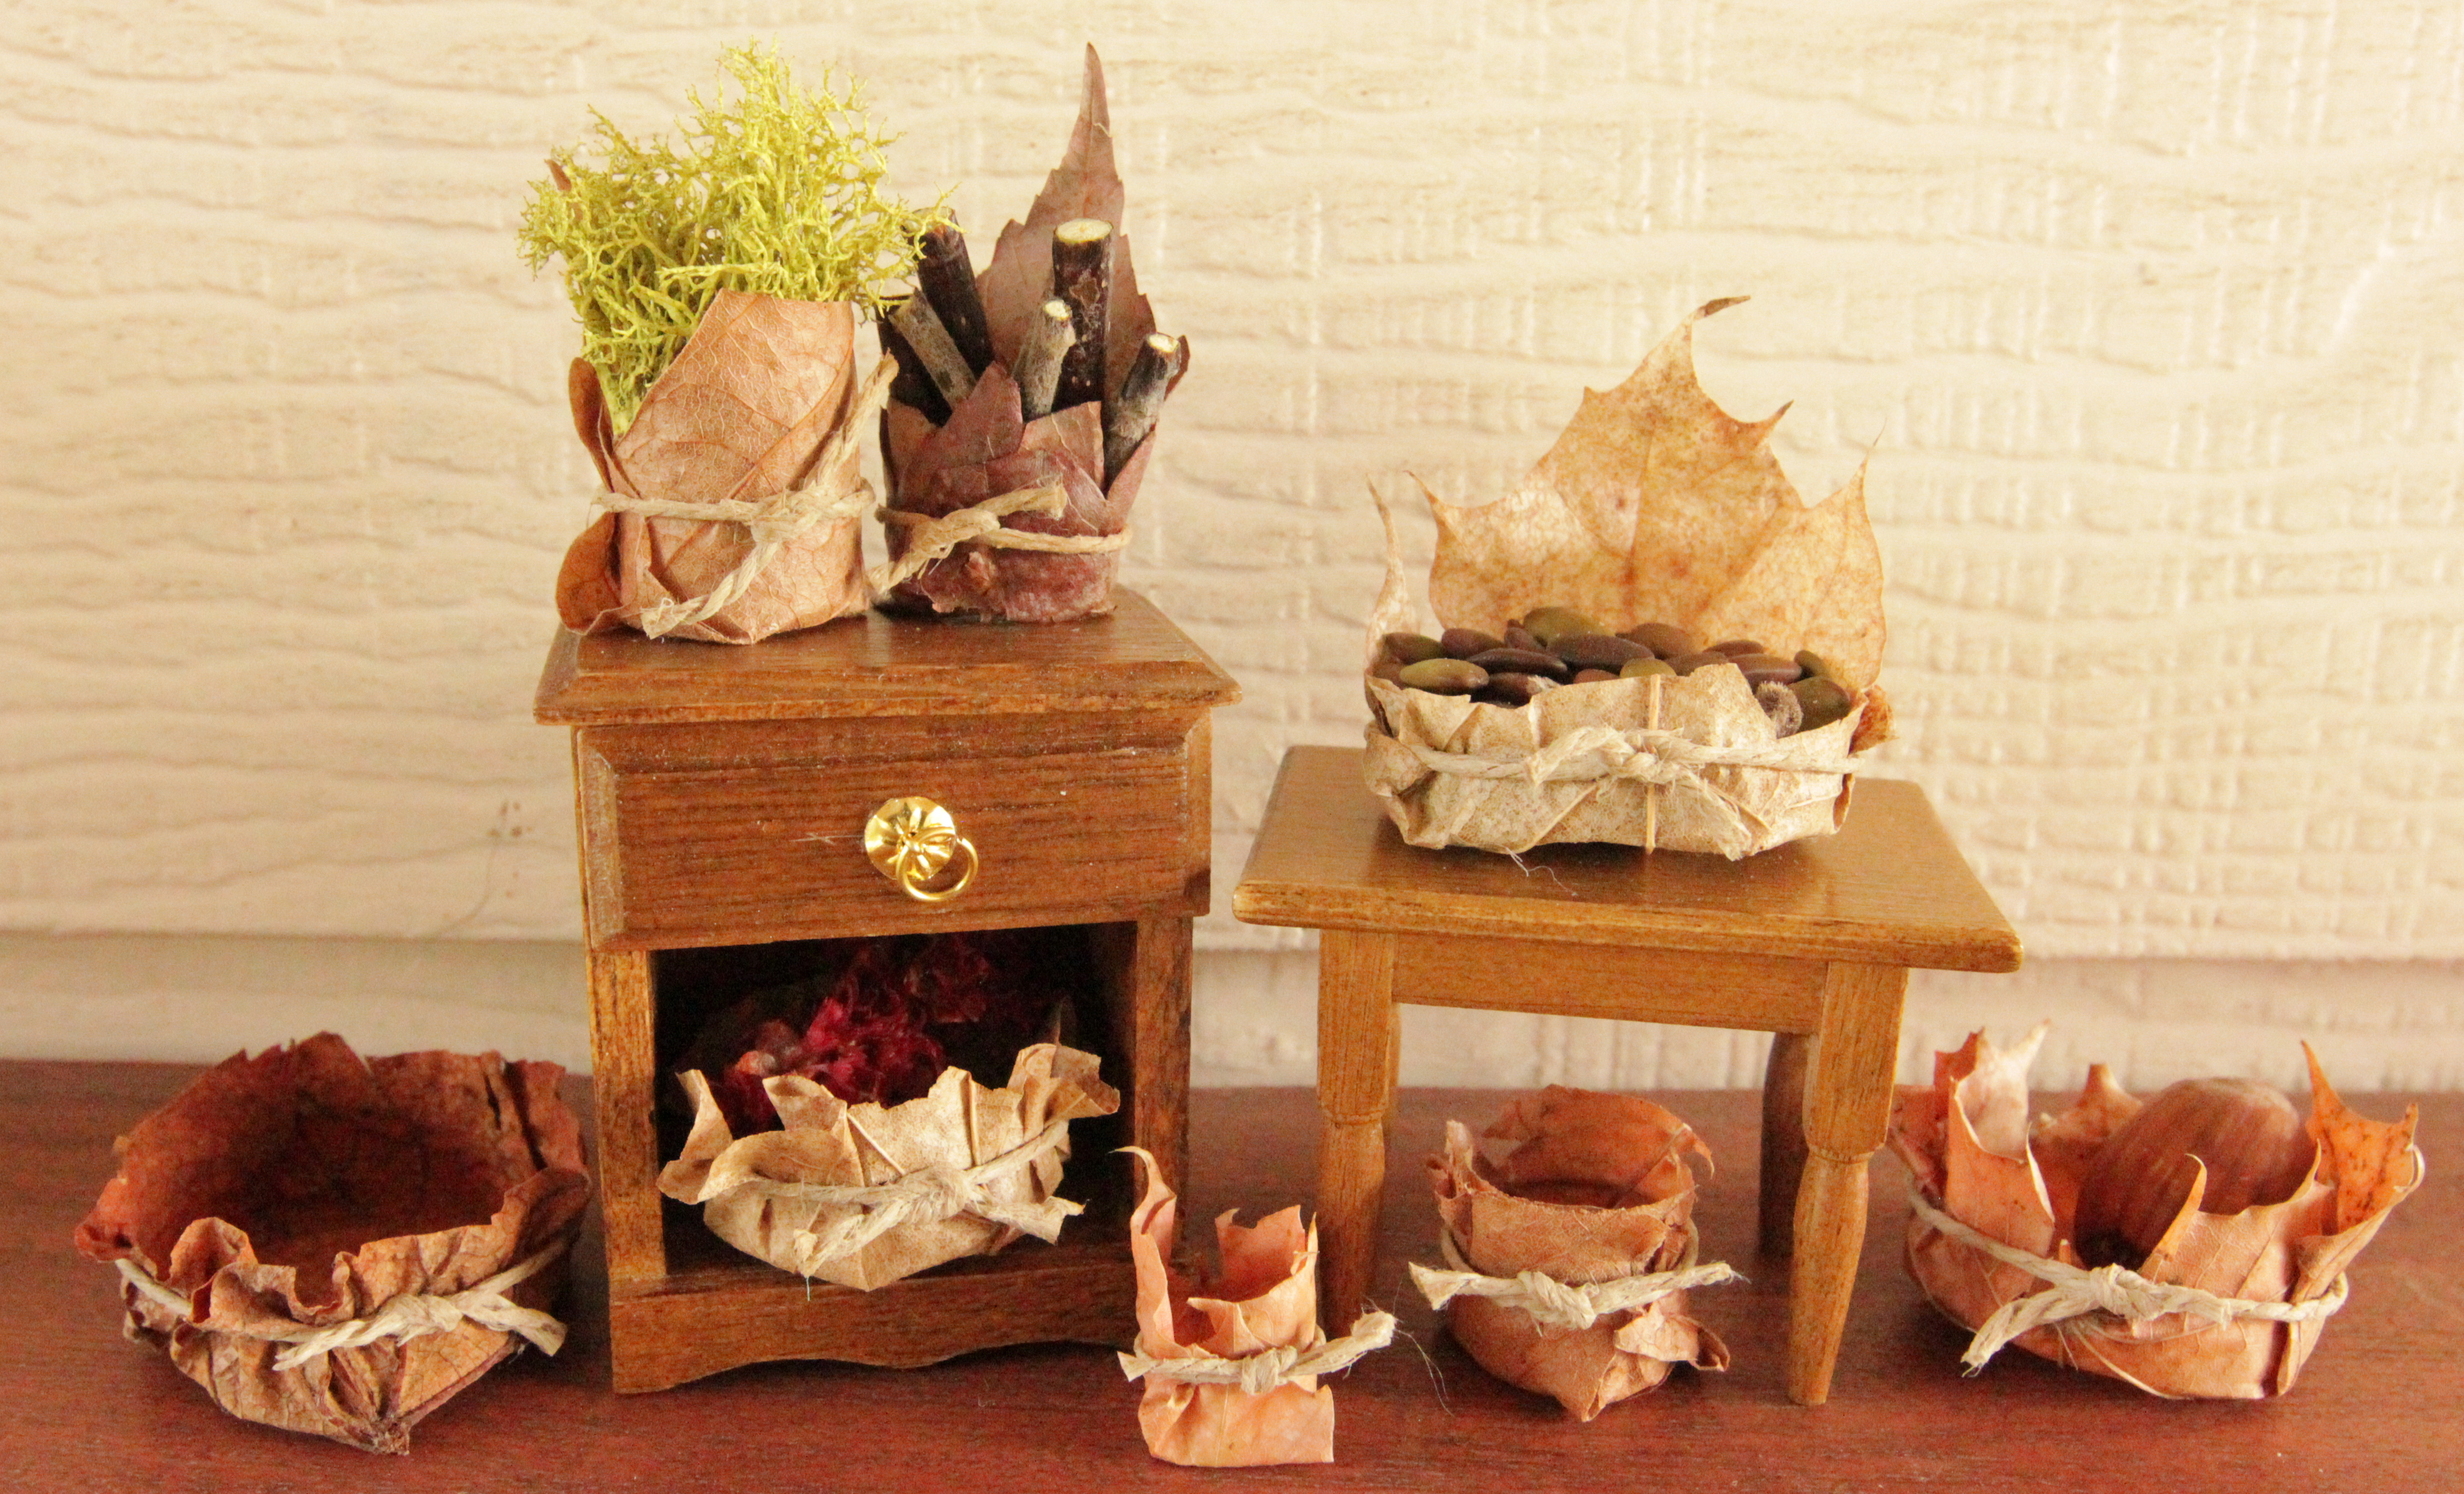 Fairy Basket Tutorial Miniature From Beneath The Ferns #miniature # Fairyhouse #fairygarden #beneaththeferns